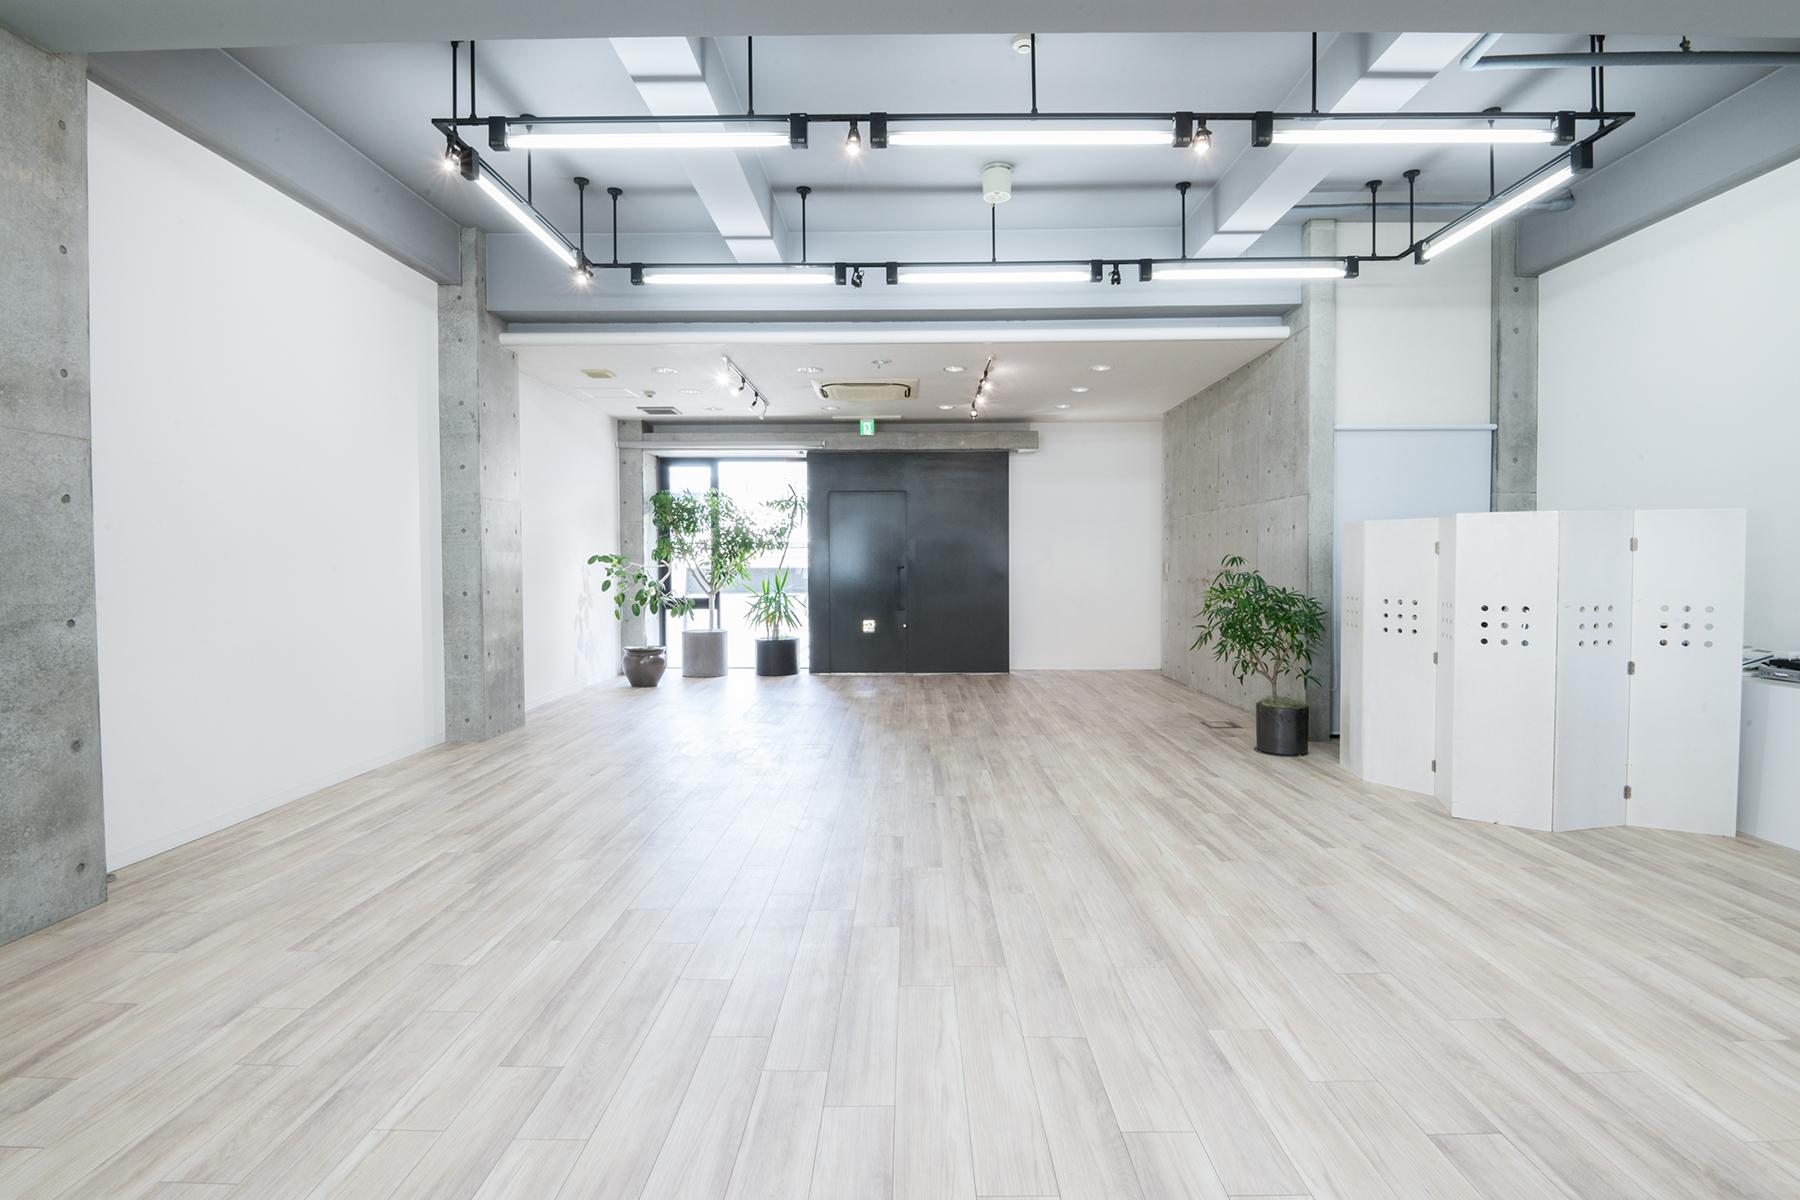 Gallery Jinnan(ギャラリー神南)